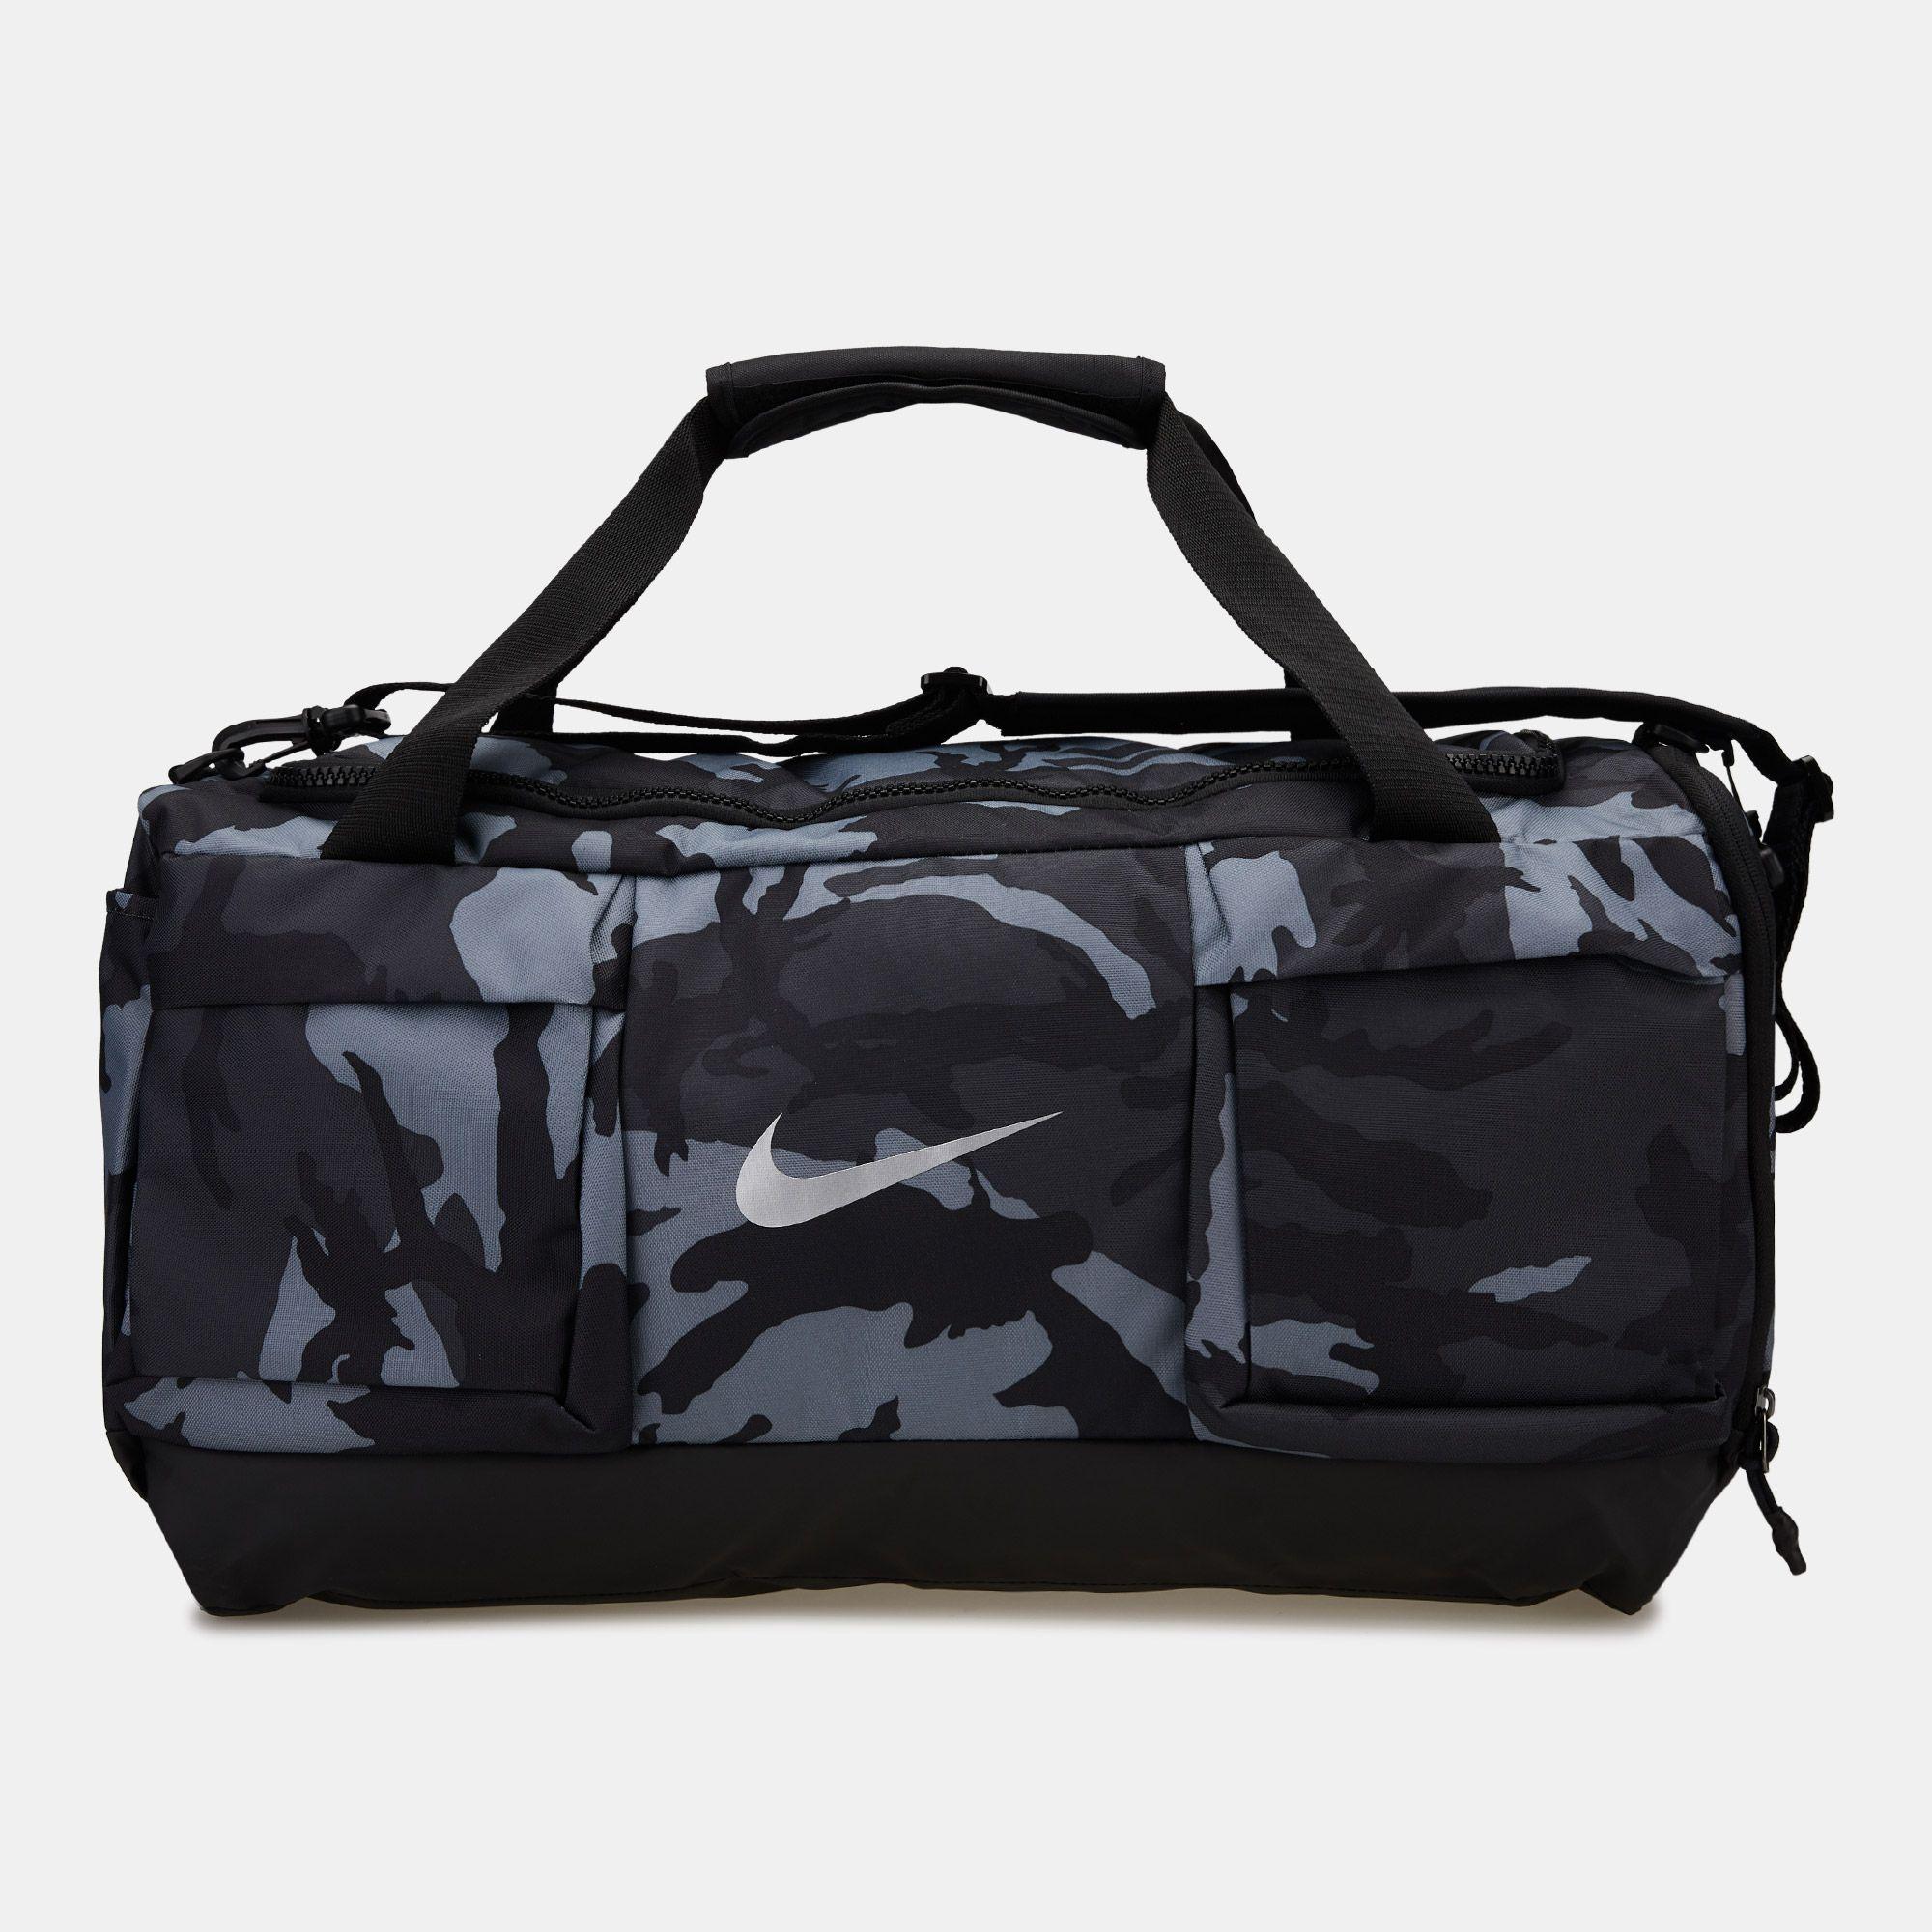 0d24c70a37f3 Nike Golf Sport Printed Duffel Bag